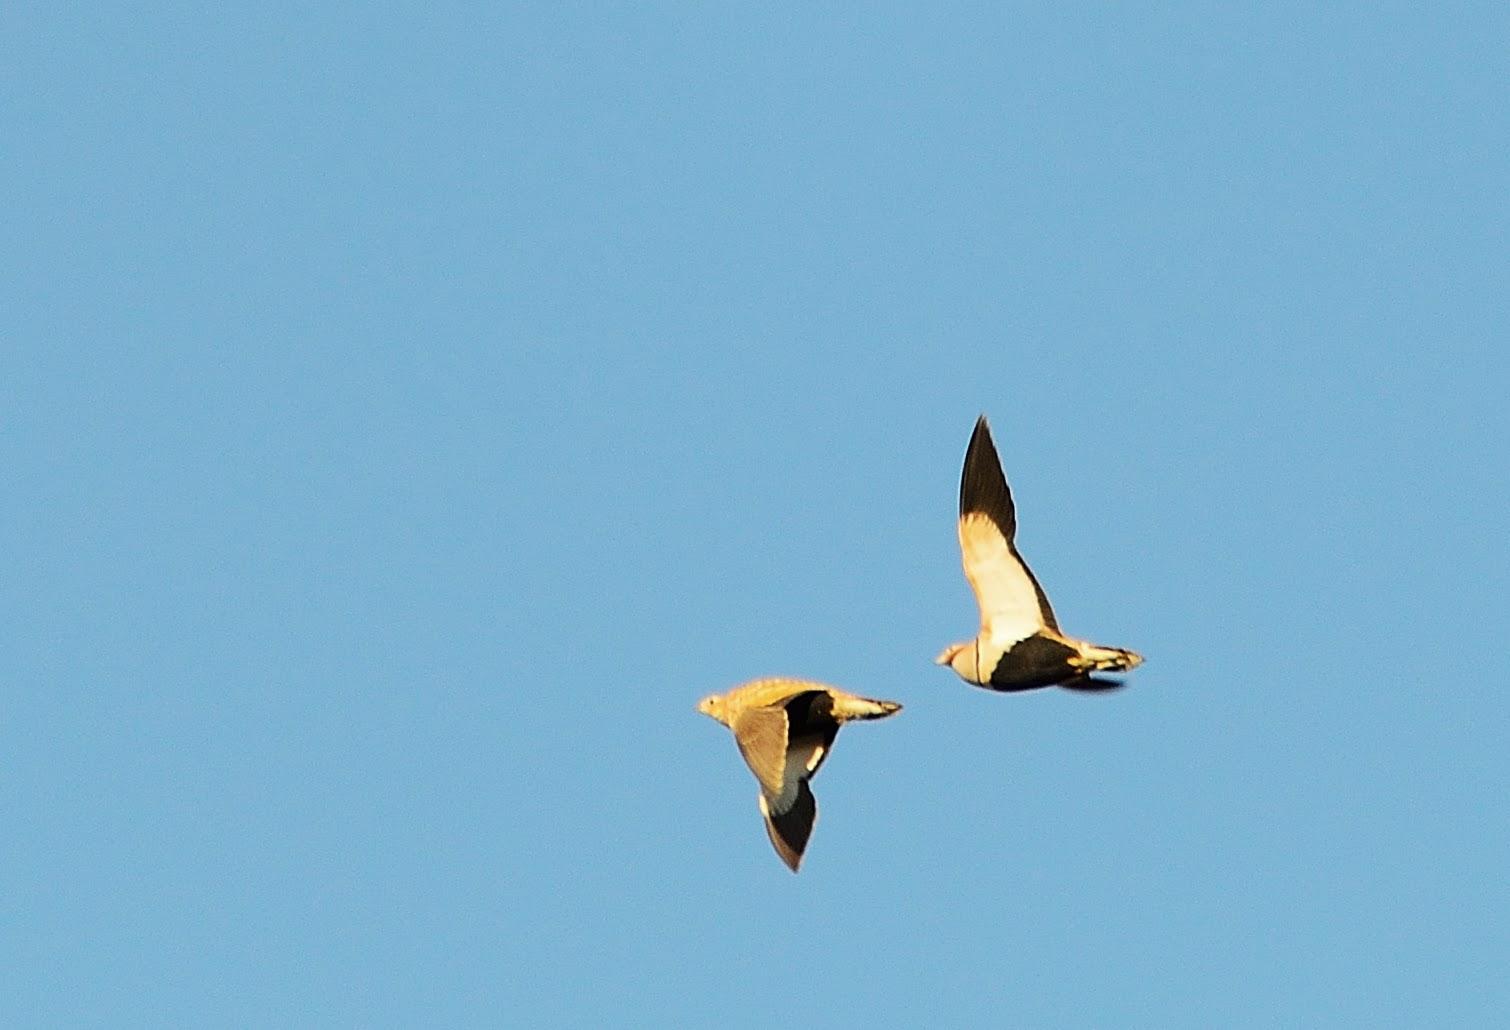 Excursión SEO/BirdLife a ZEPA del Alto Guadiato. Ganga Ortega